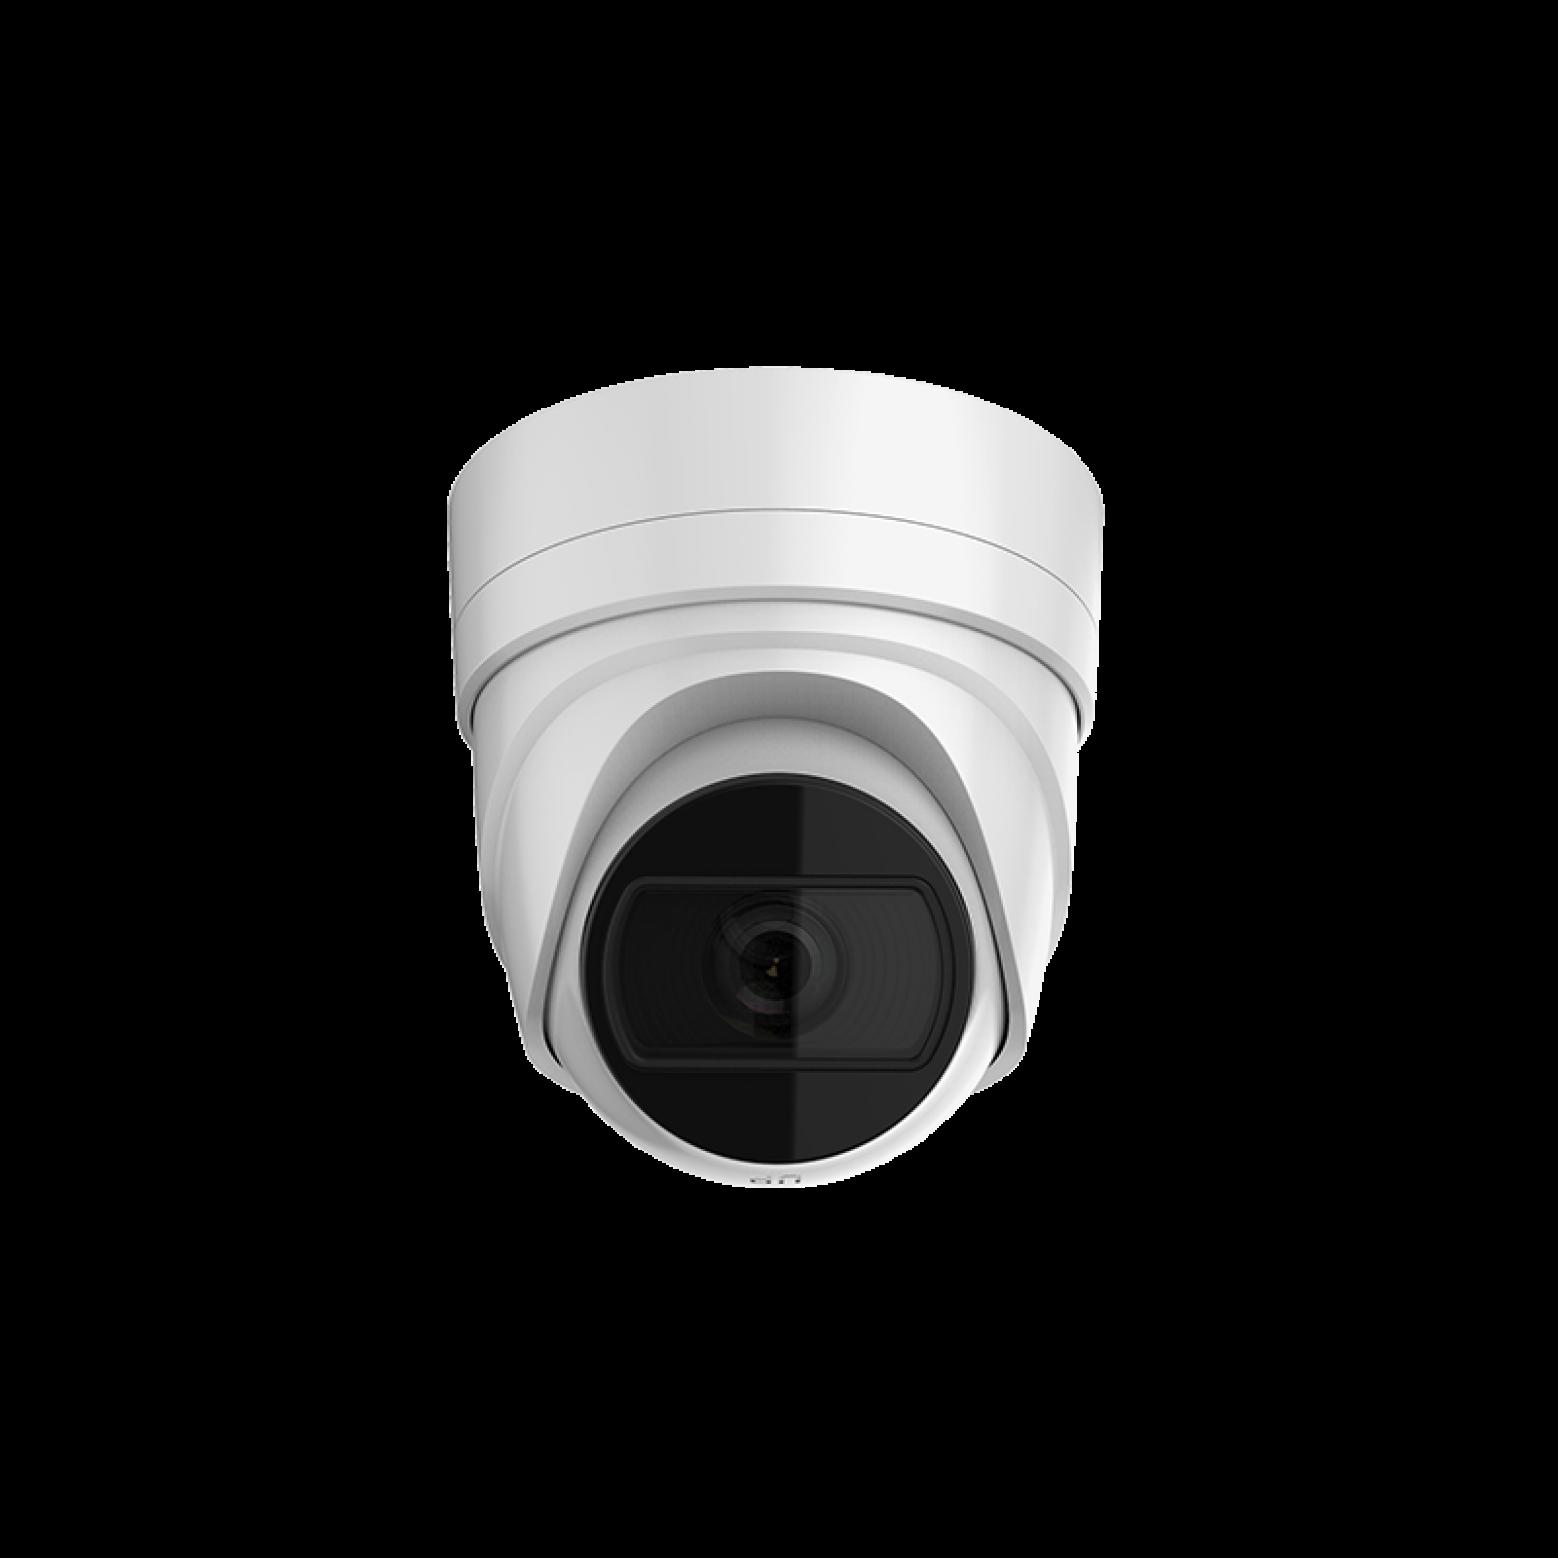 Safire SF-IPT998ZWHA-8P, 8 Megapixel, 2.8 ~ 12mm varifocal, Turret camera